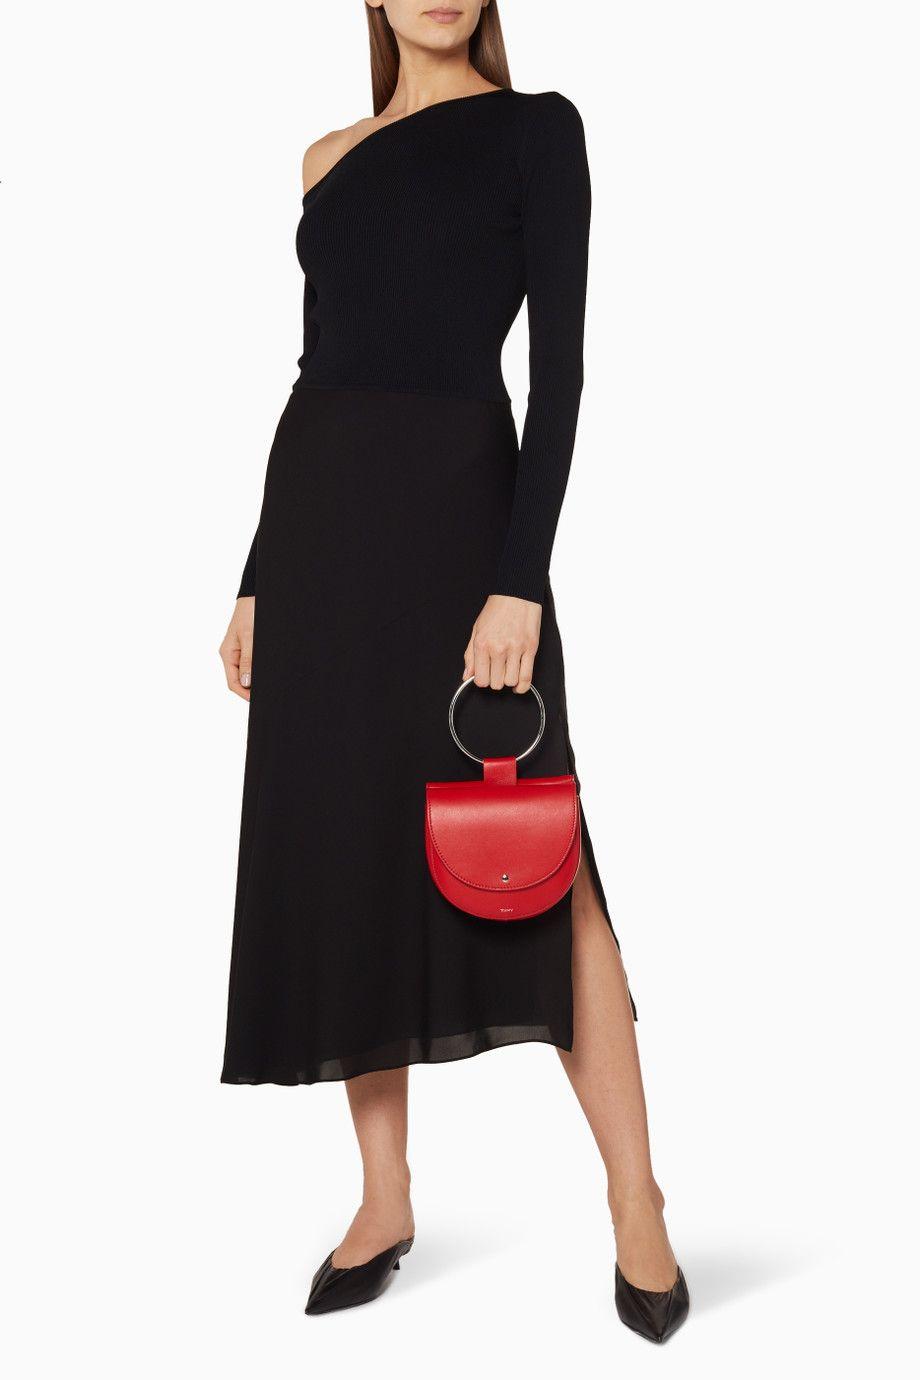 e98f5b60210 Shop Luxury Theory Black Asymmetric Sweater Dress